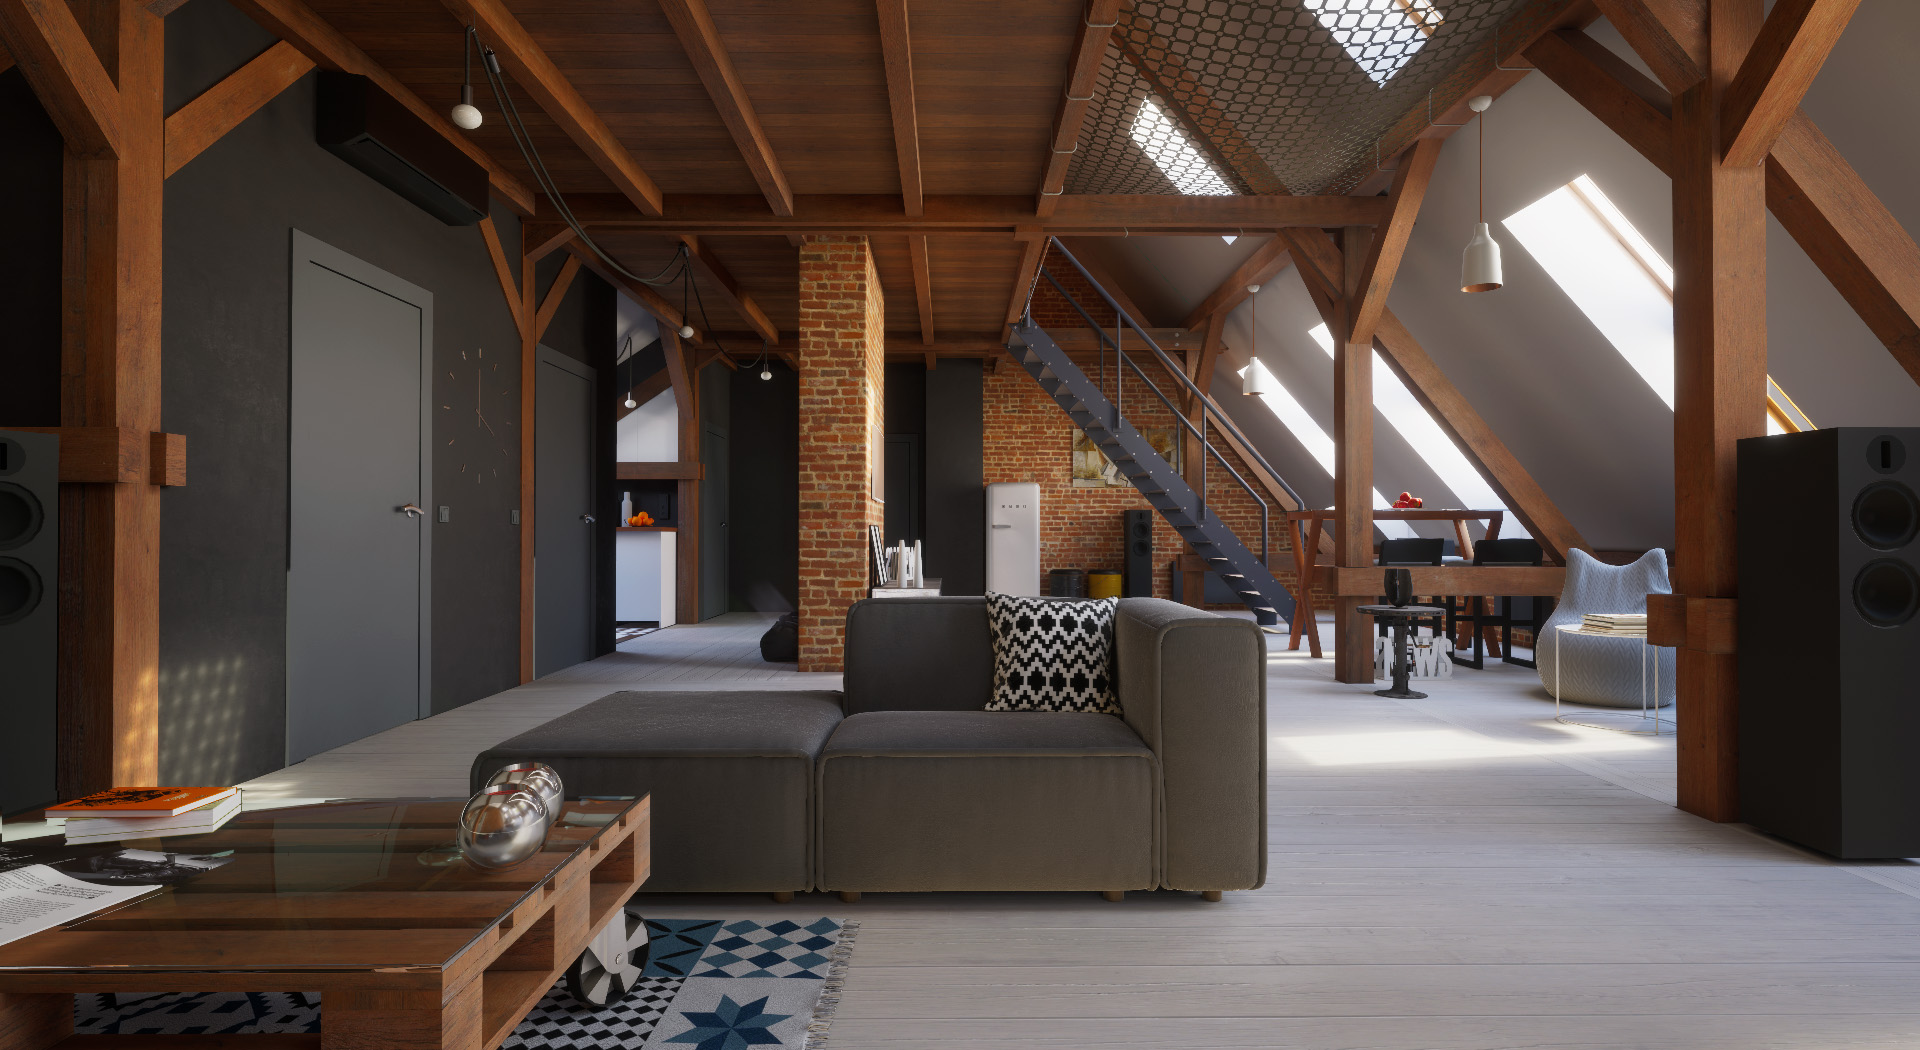 Loft interior with interactive drone (Unreal Engine 4)